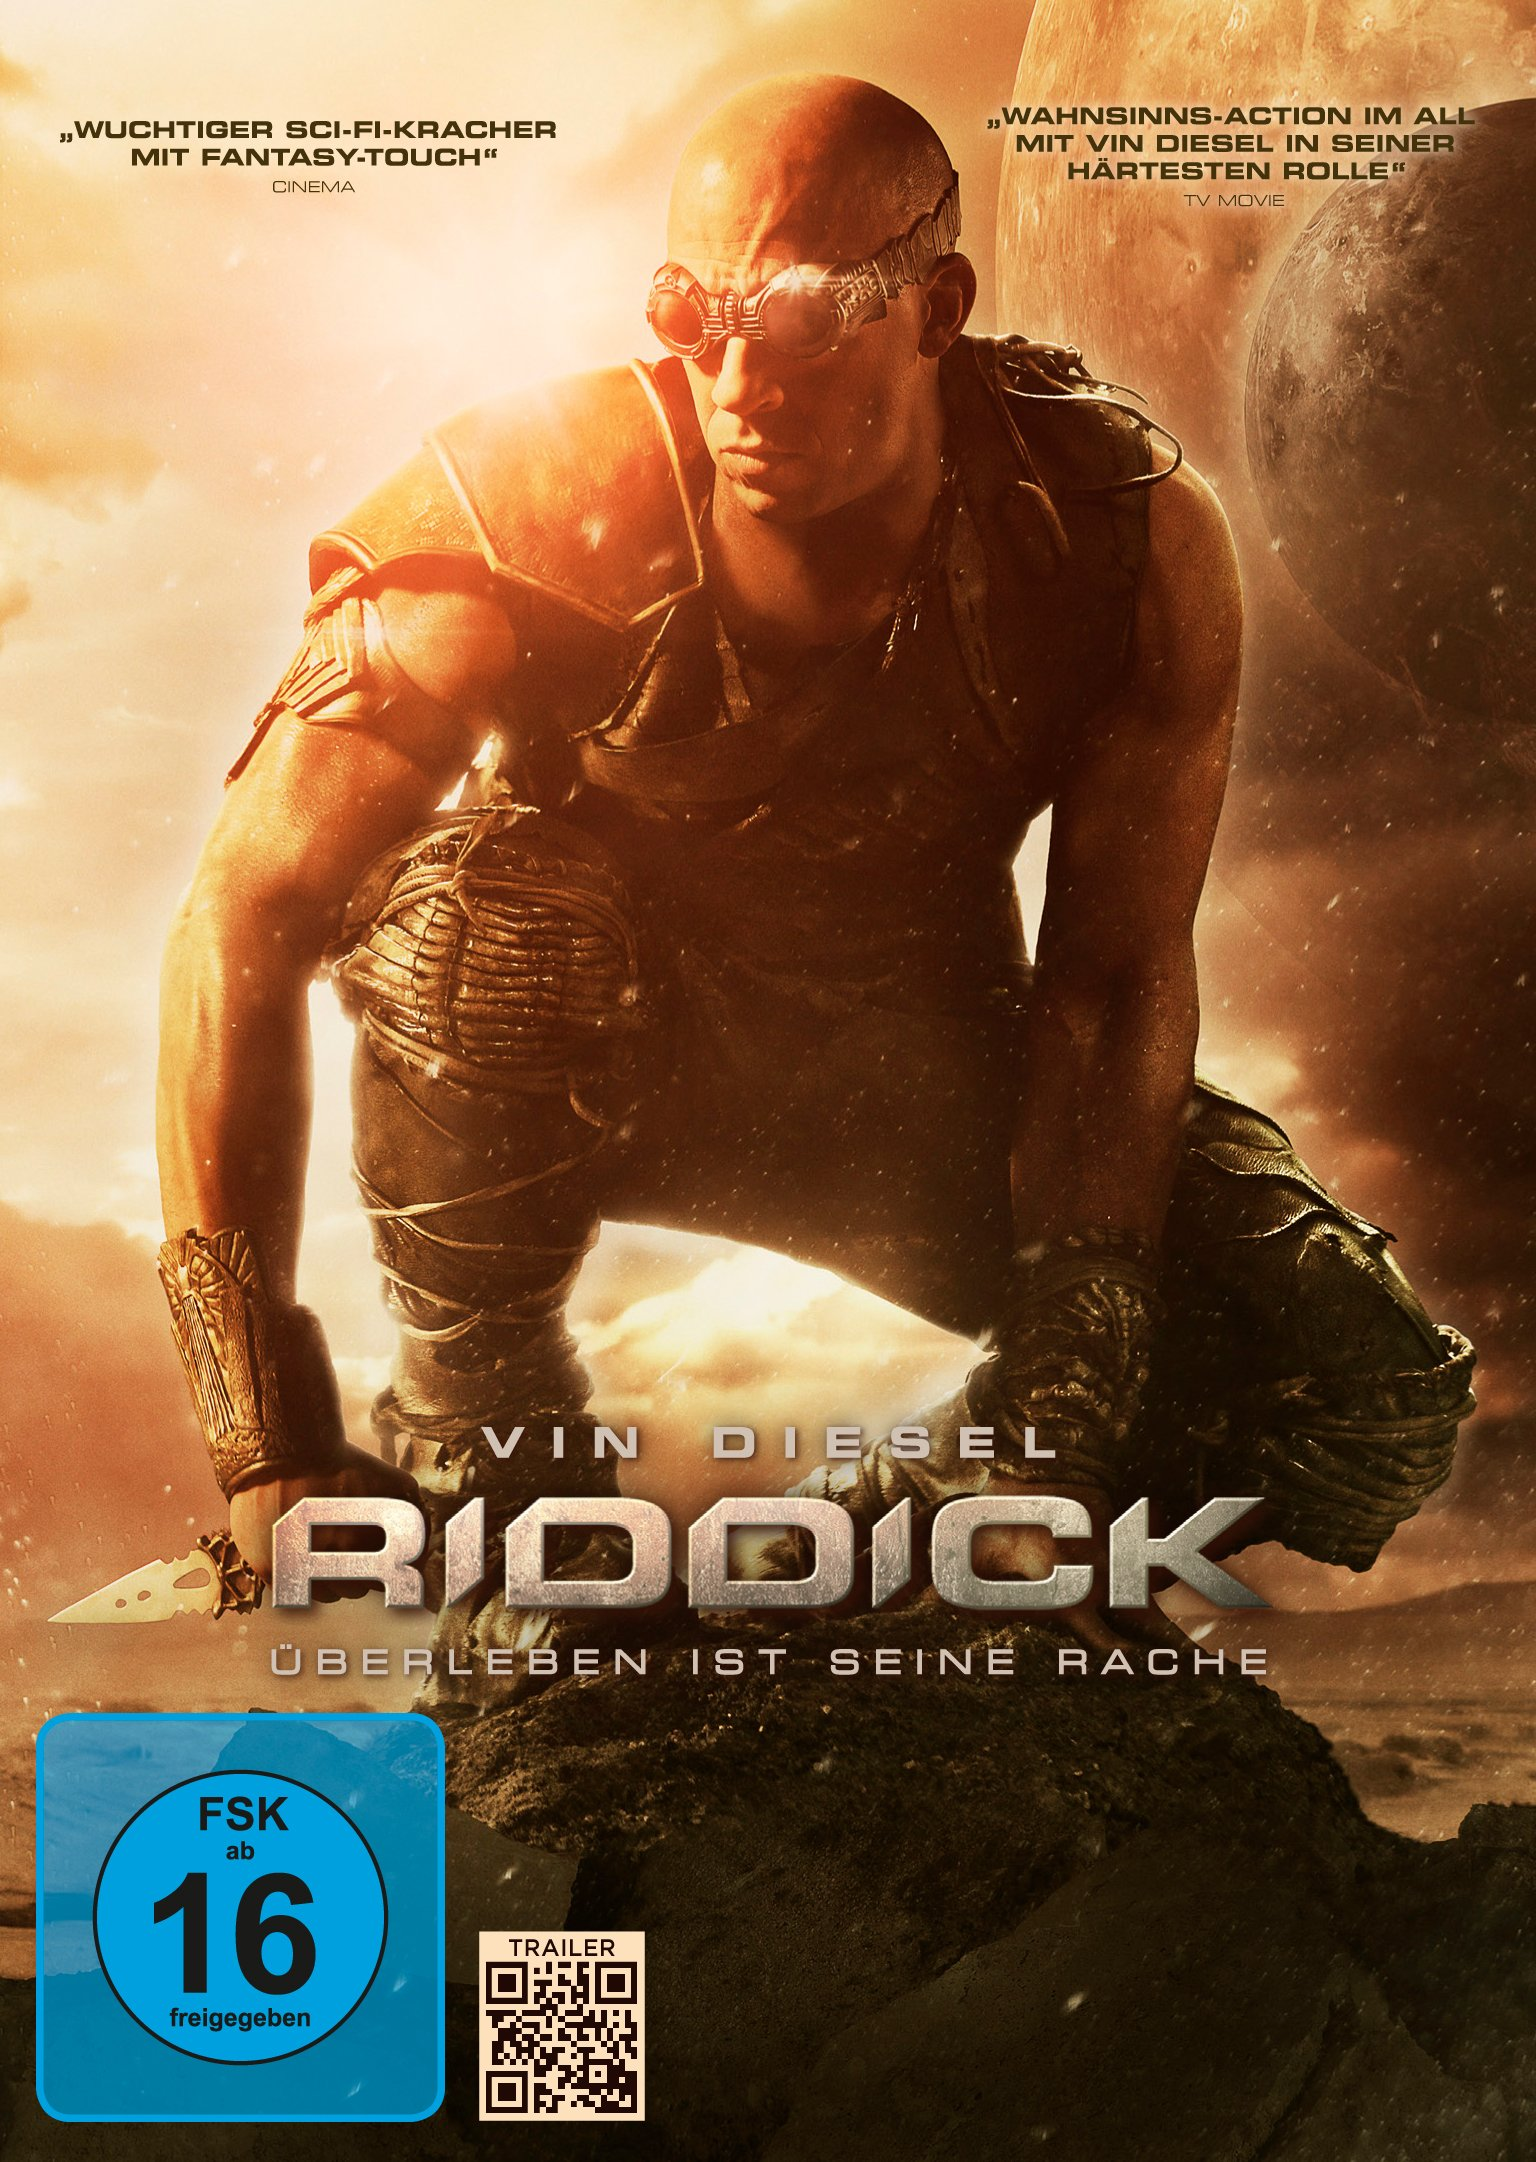 : Riddick Ueberleben ist seine Rache Extended German 2013 Ac3 Bdrip x264 iNternal-VideoStar